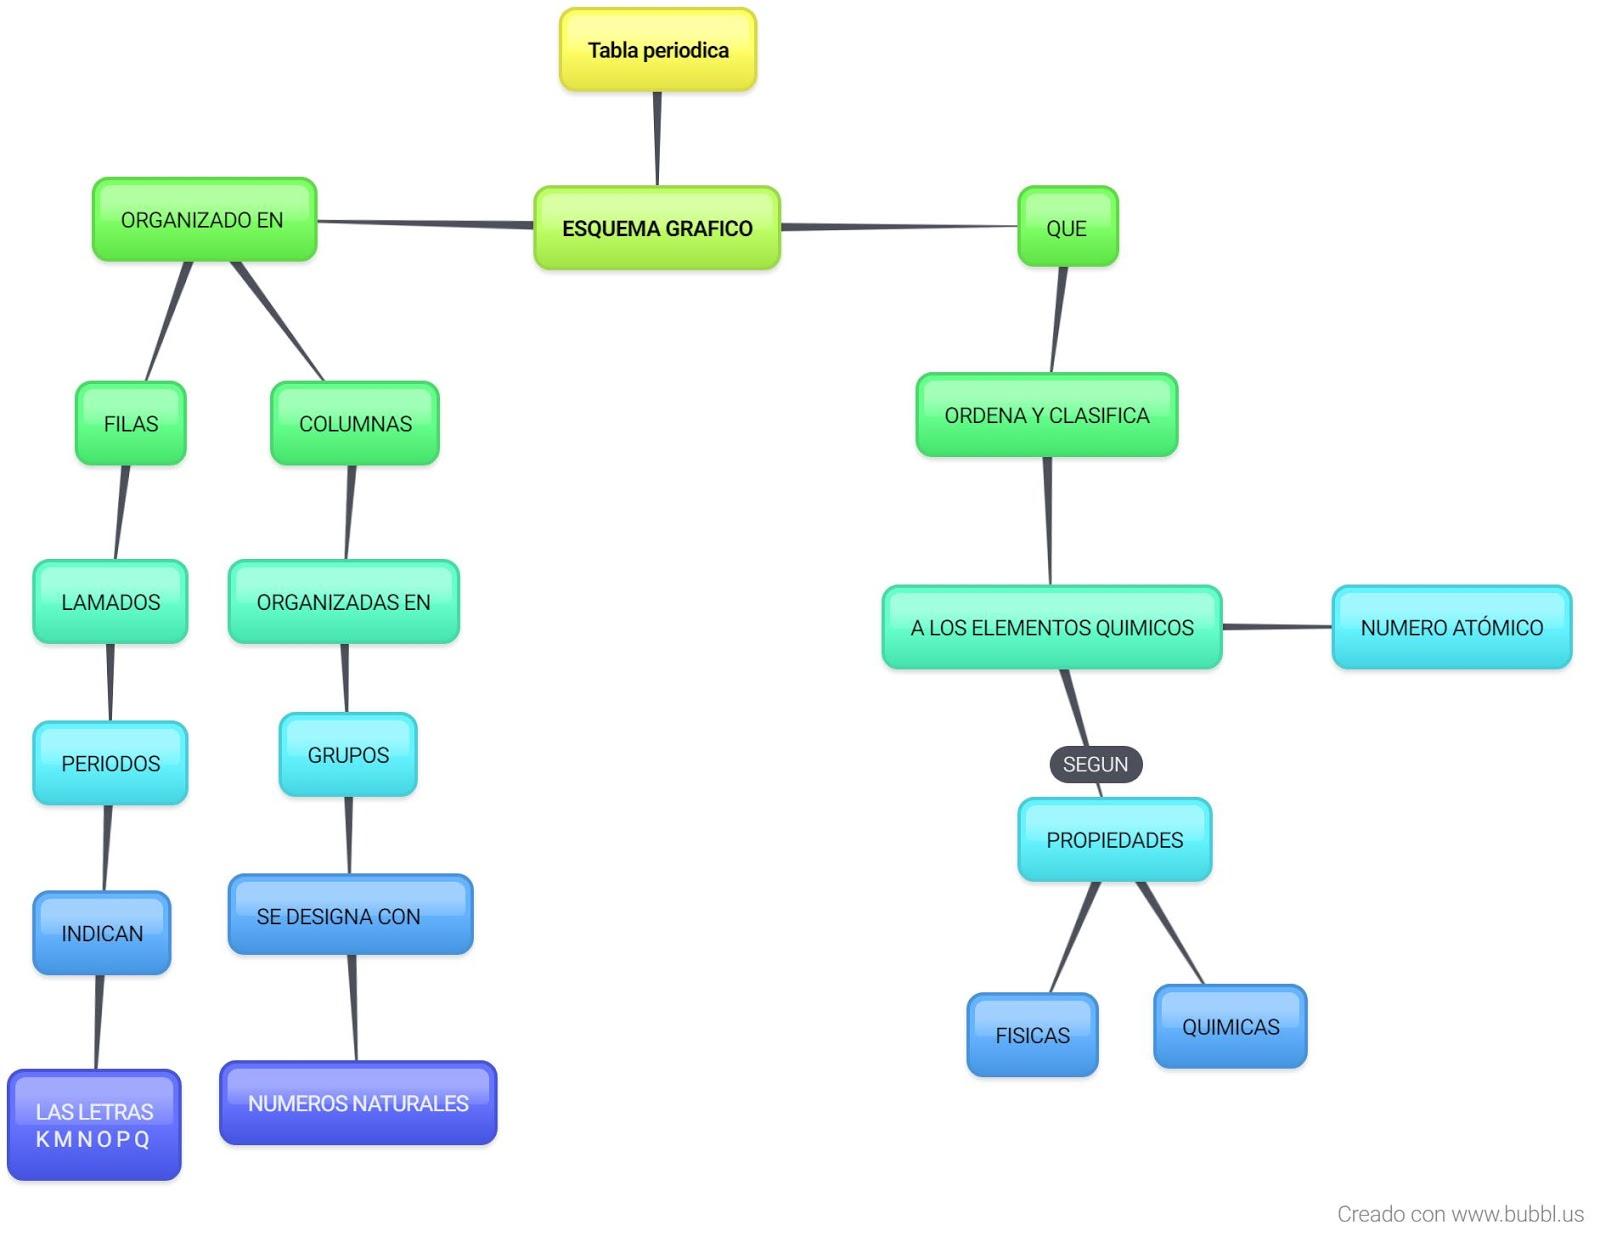 La qumica es vida mapa conceptual de la tabla periodica urtaz Choice Image